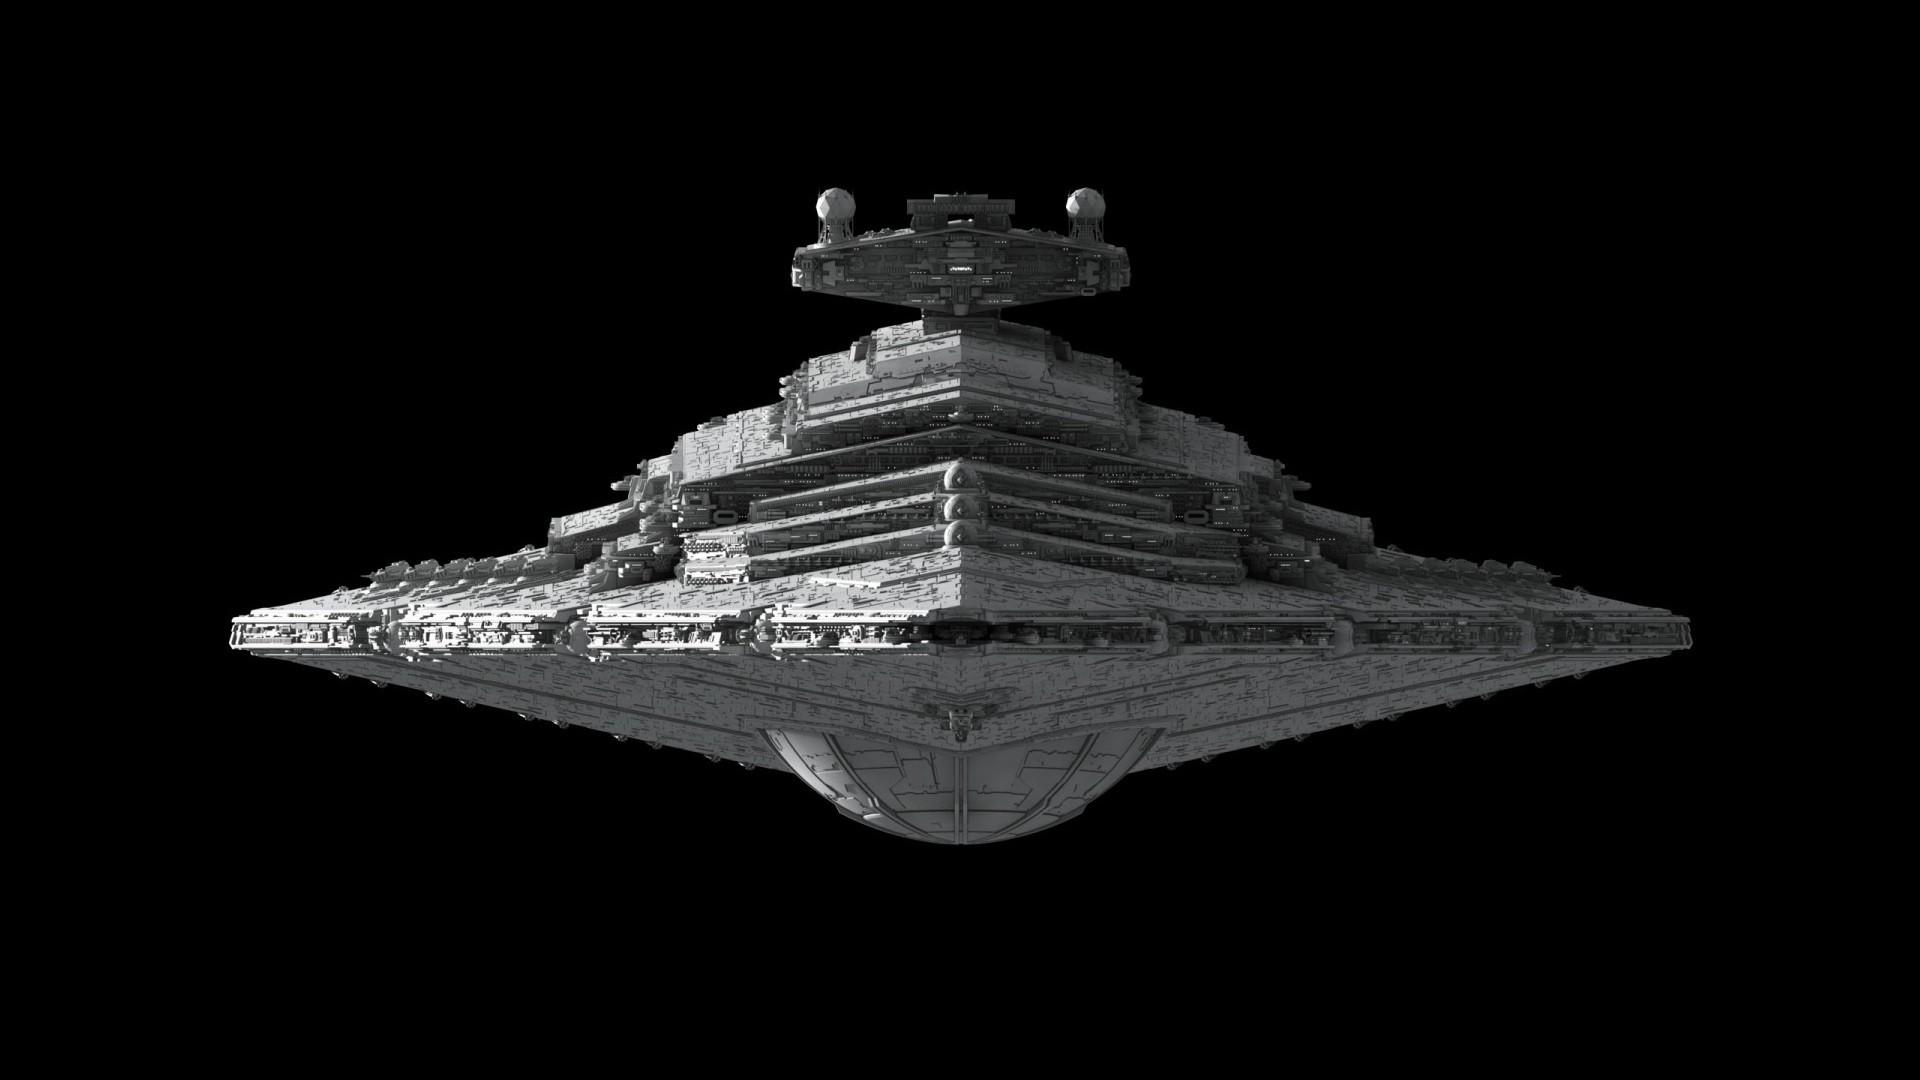 General 1920x1080 Star Wars Imperial Forces render spaceship vehicle Star Wars Ships Star Destroyer fractalsponge